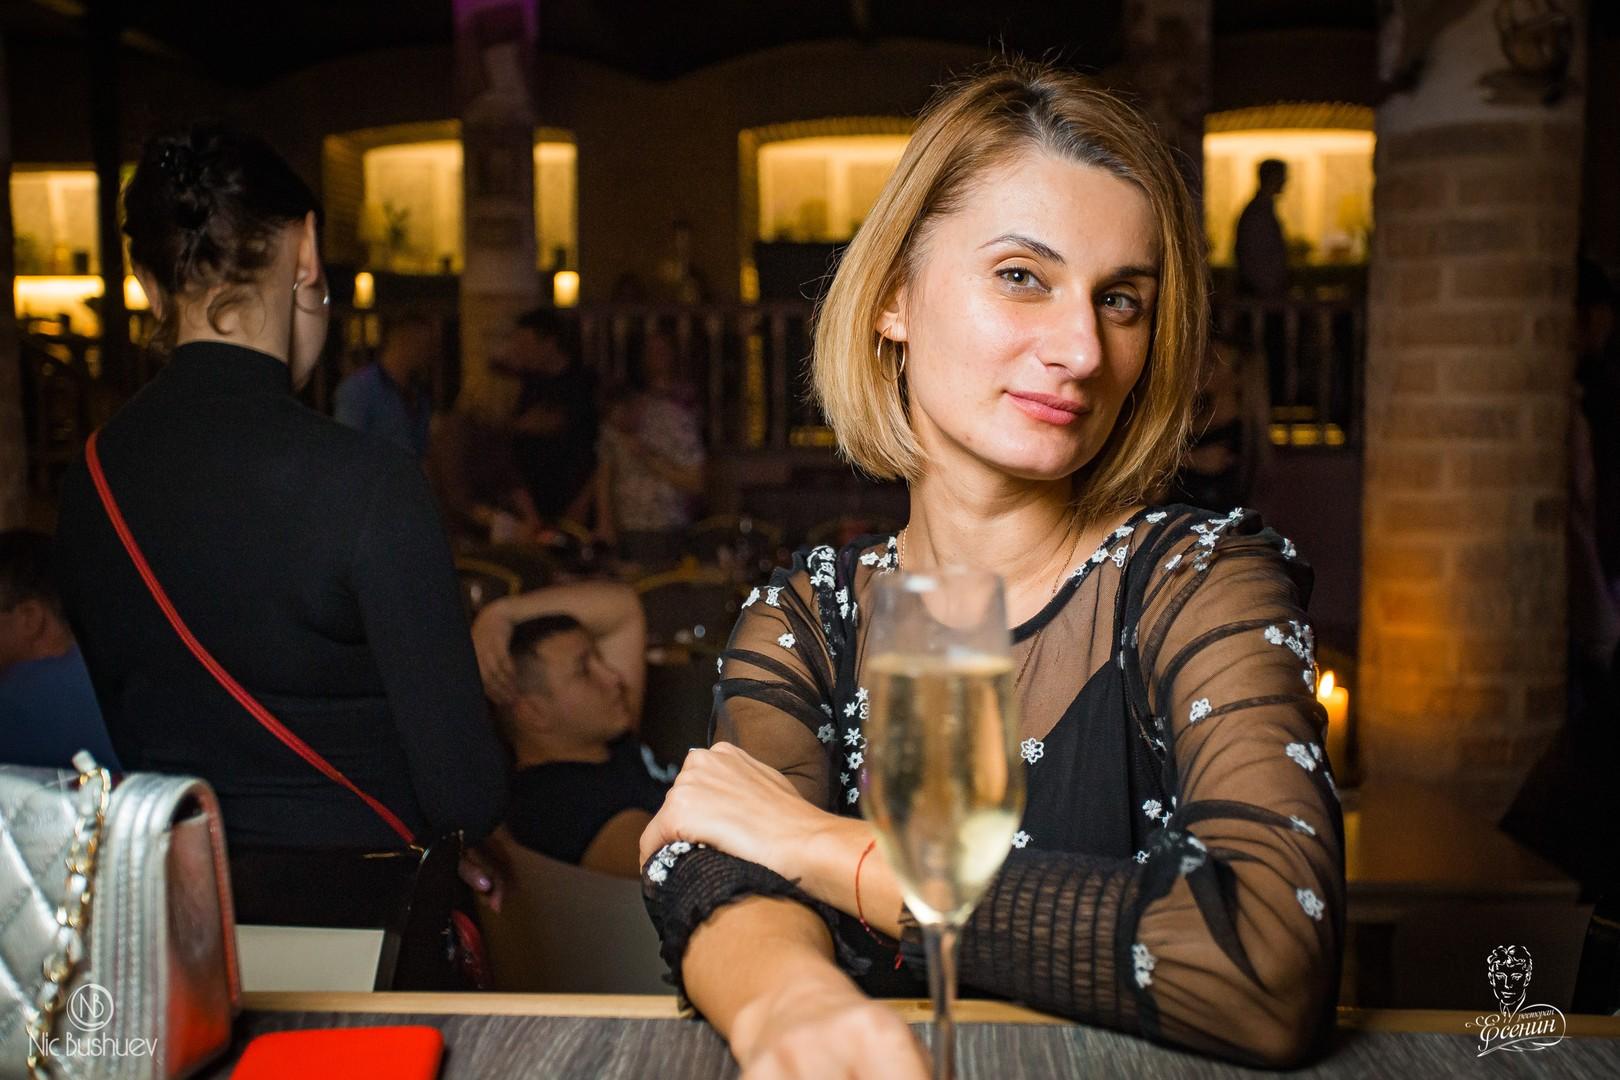 Ресторан Орехово-Зуево Есенин 29_02_2020 (78)